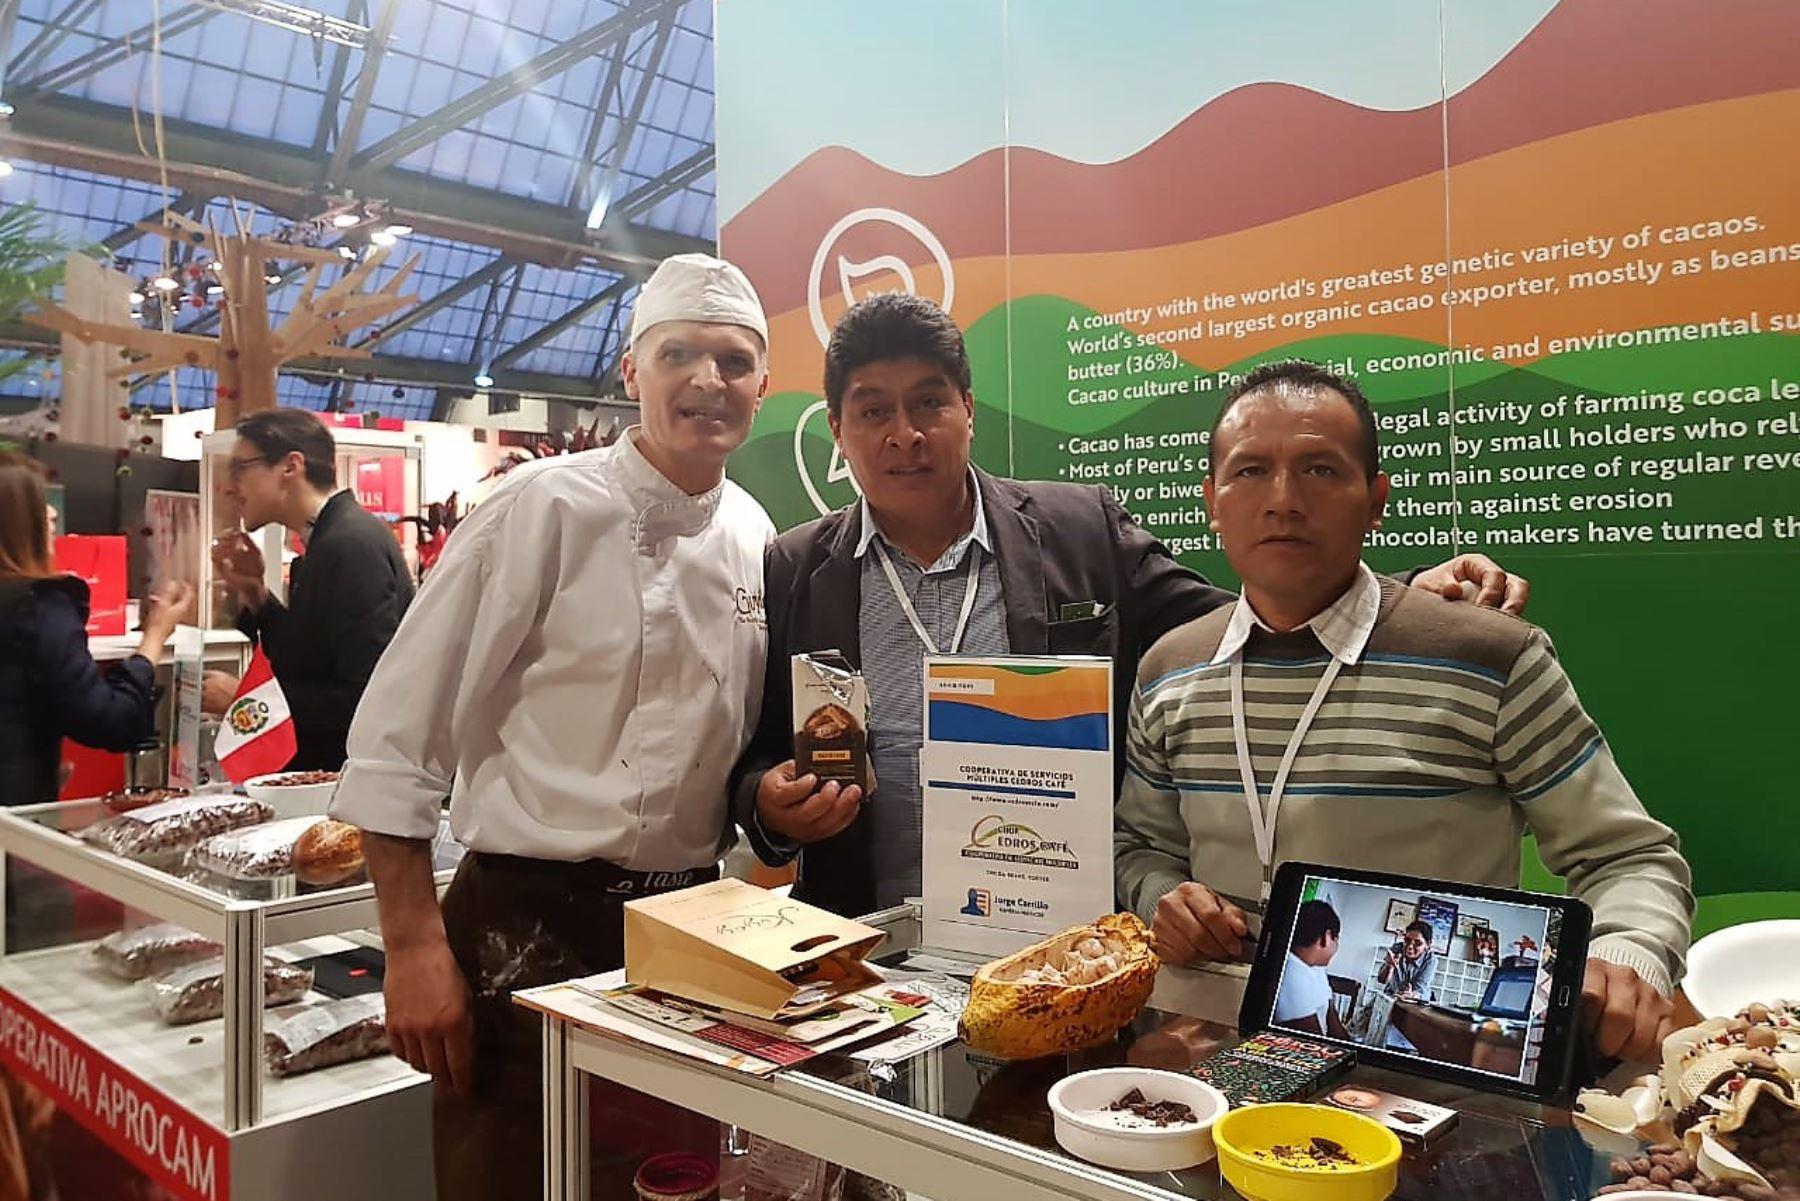 Productores de cacao de Huánuco destacan en Salón del Cacao de Bélgica. ANDINA/Difusión